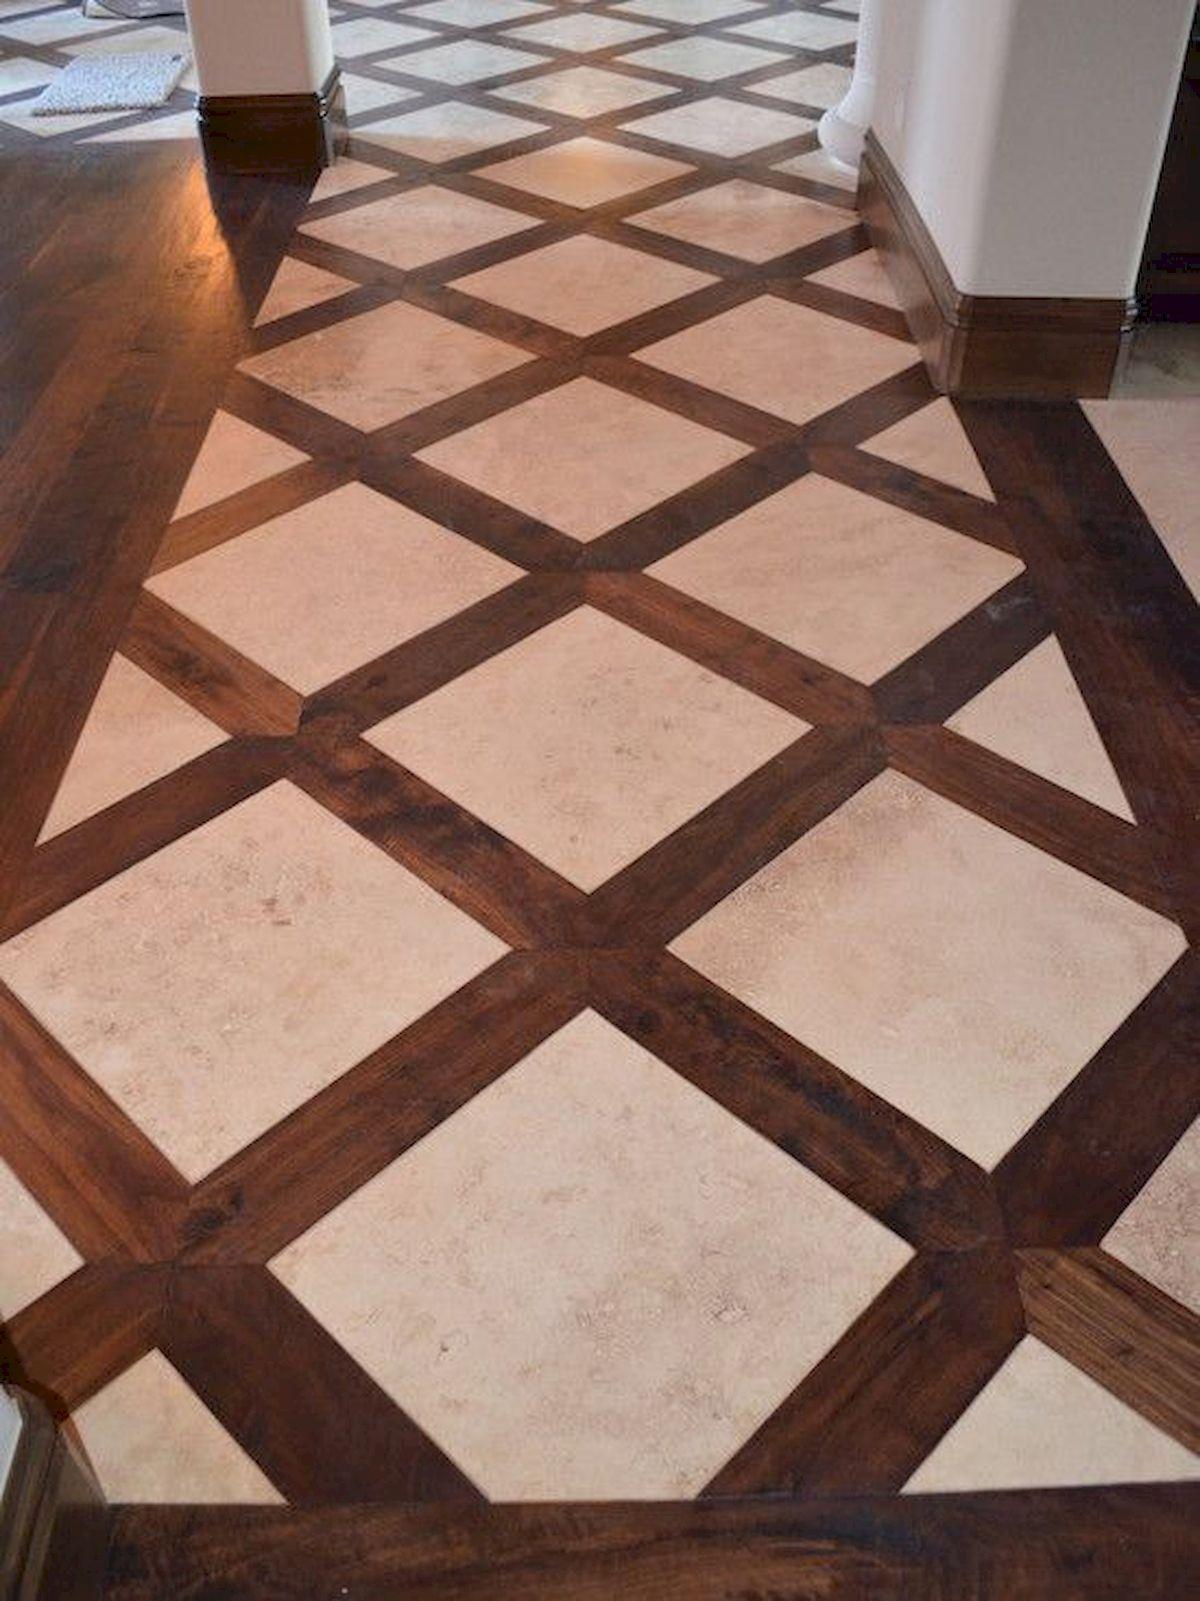 40 Best Tile Flooring Designs Ideas For Modern Kitchen (10)